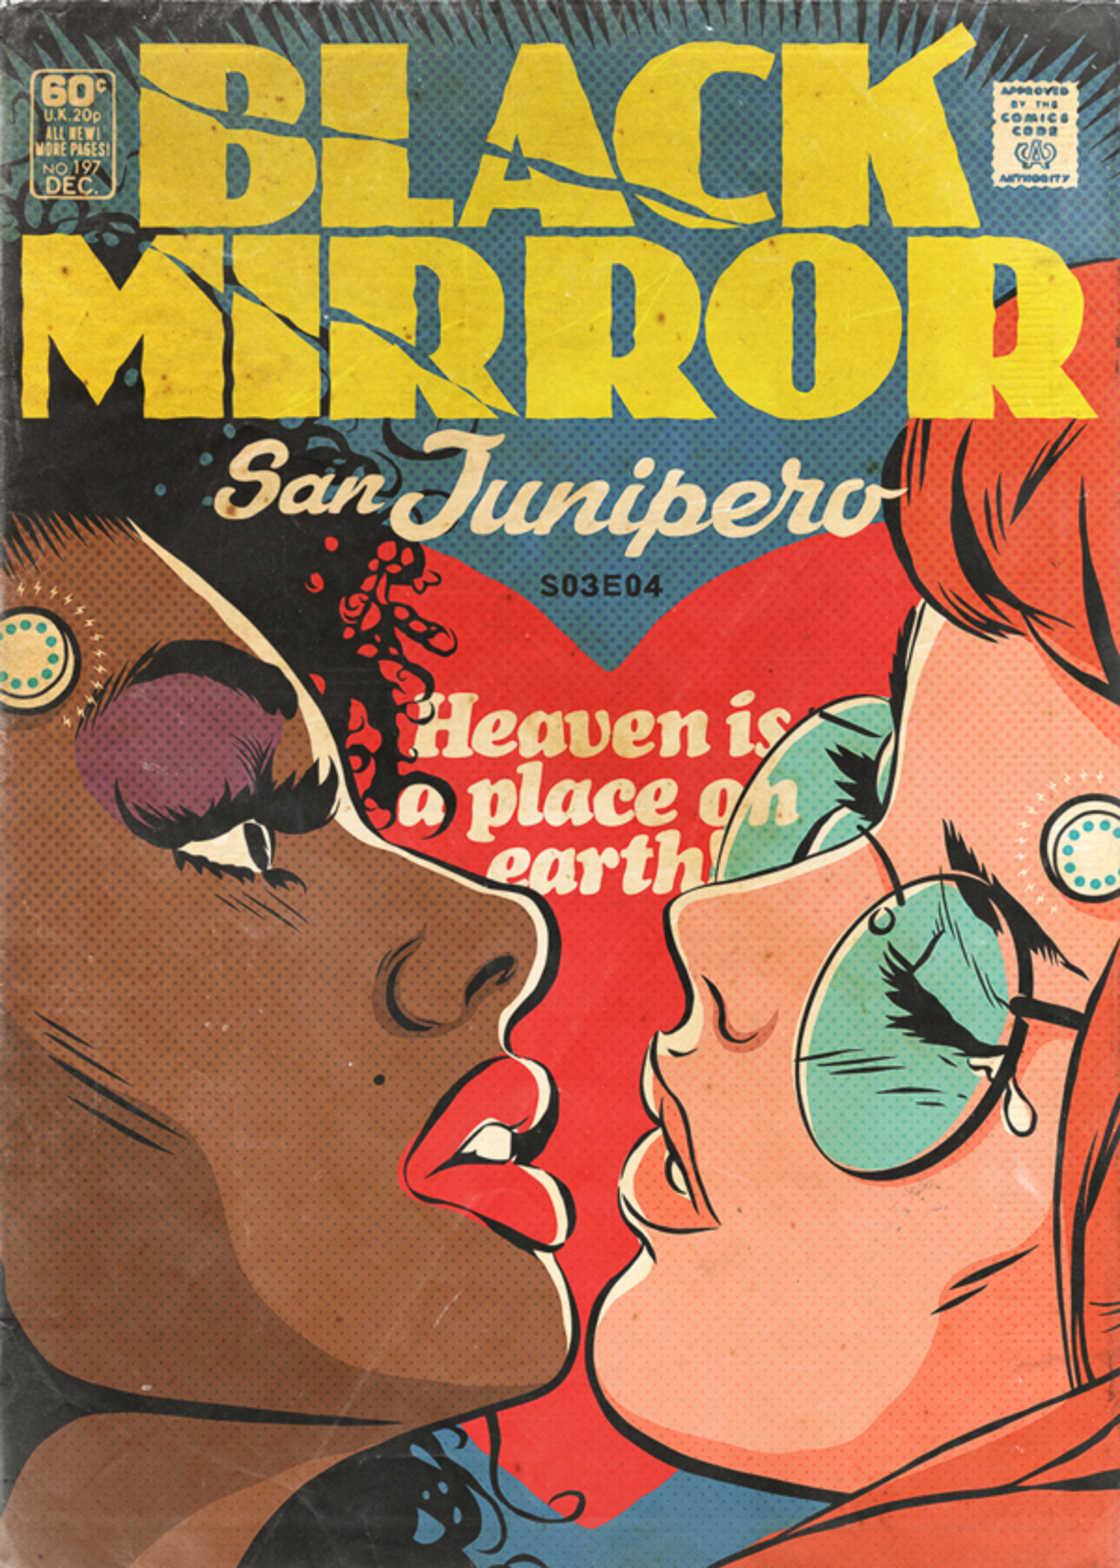 Black Mirror - Transformer les episodes en comics americains vintage